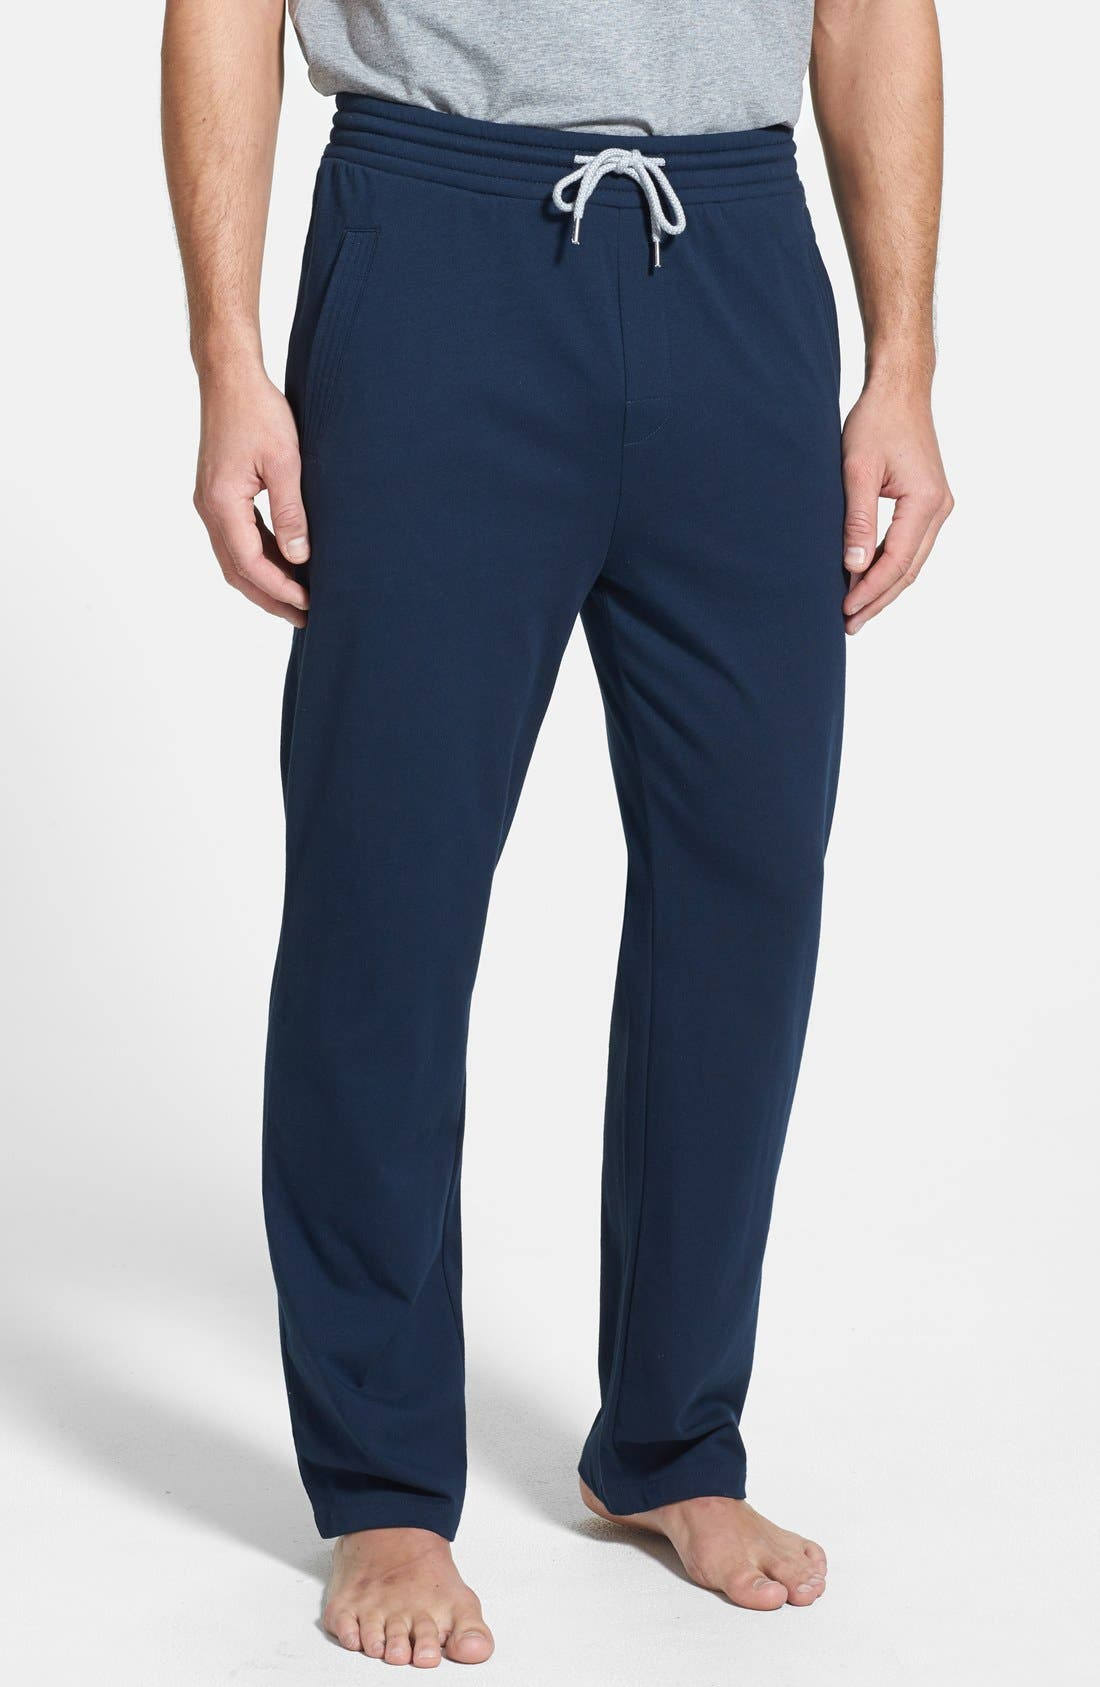 Alternate Image 1 Selected - BOSS HUGO BOSS 'Innovation 3' Lounge Pants